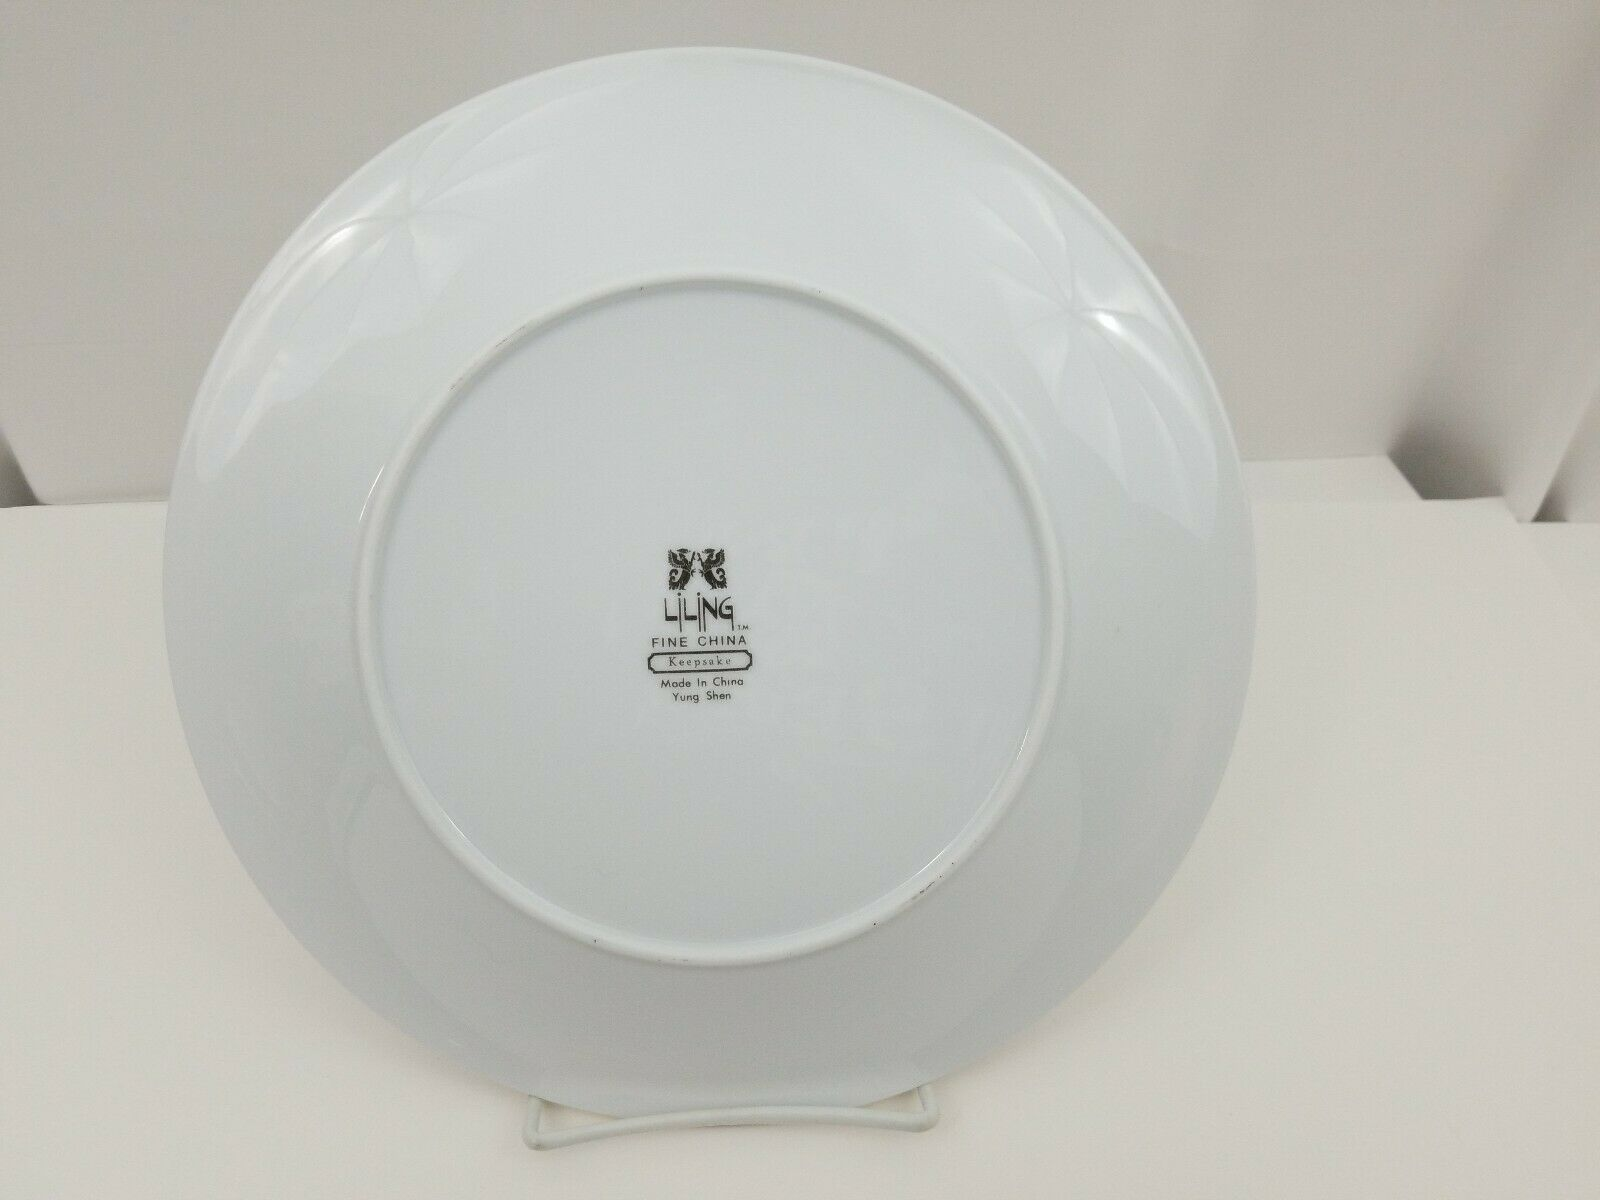 "Liling Fine China Dinner Plates Set of 4 Yung Shen White Roses Keepsake 10 5/8"" image 6"